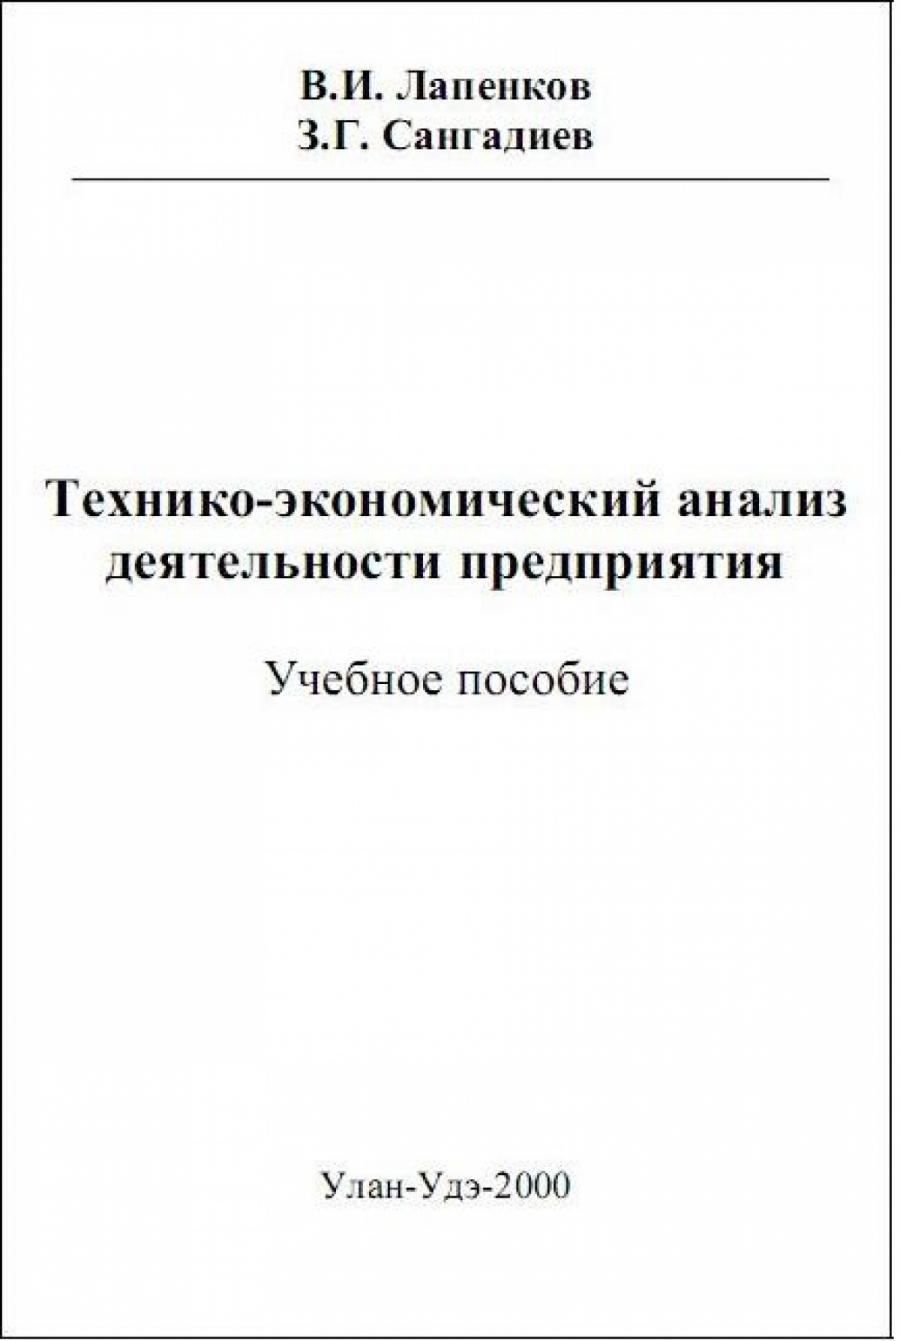 Обложка книги:  лапенков в.и., сангадиев з.г. - технико-экономический анализ деятельности предприятия